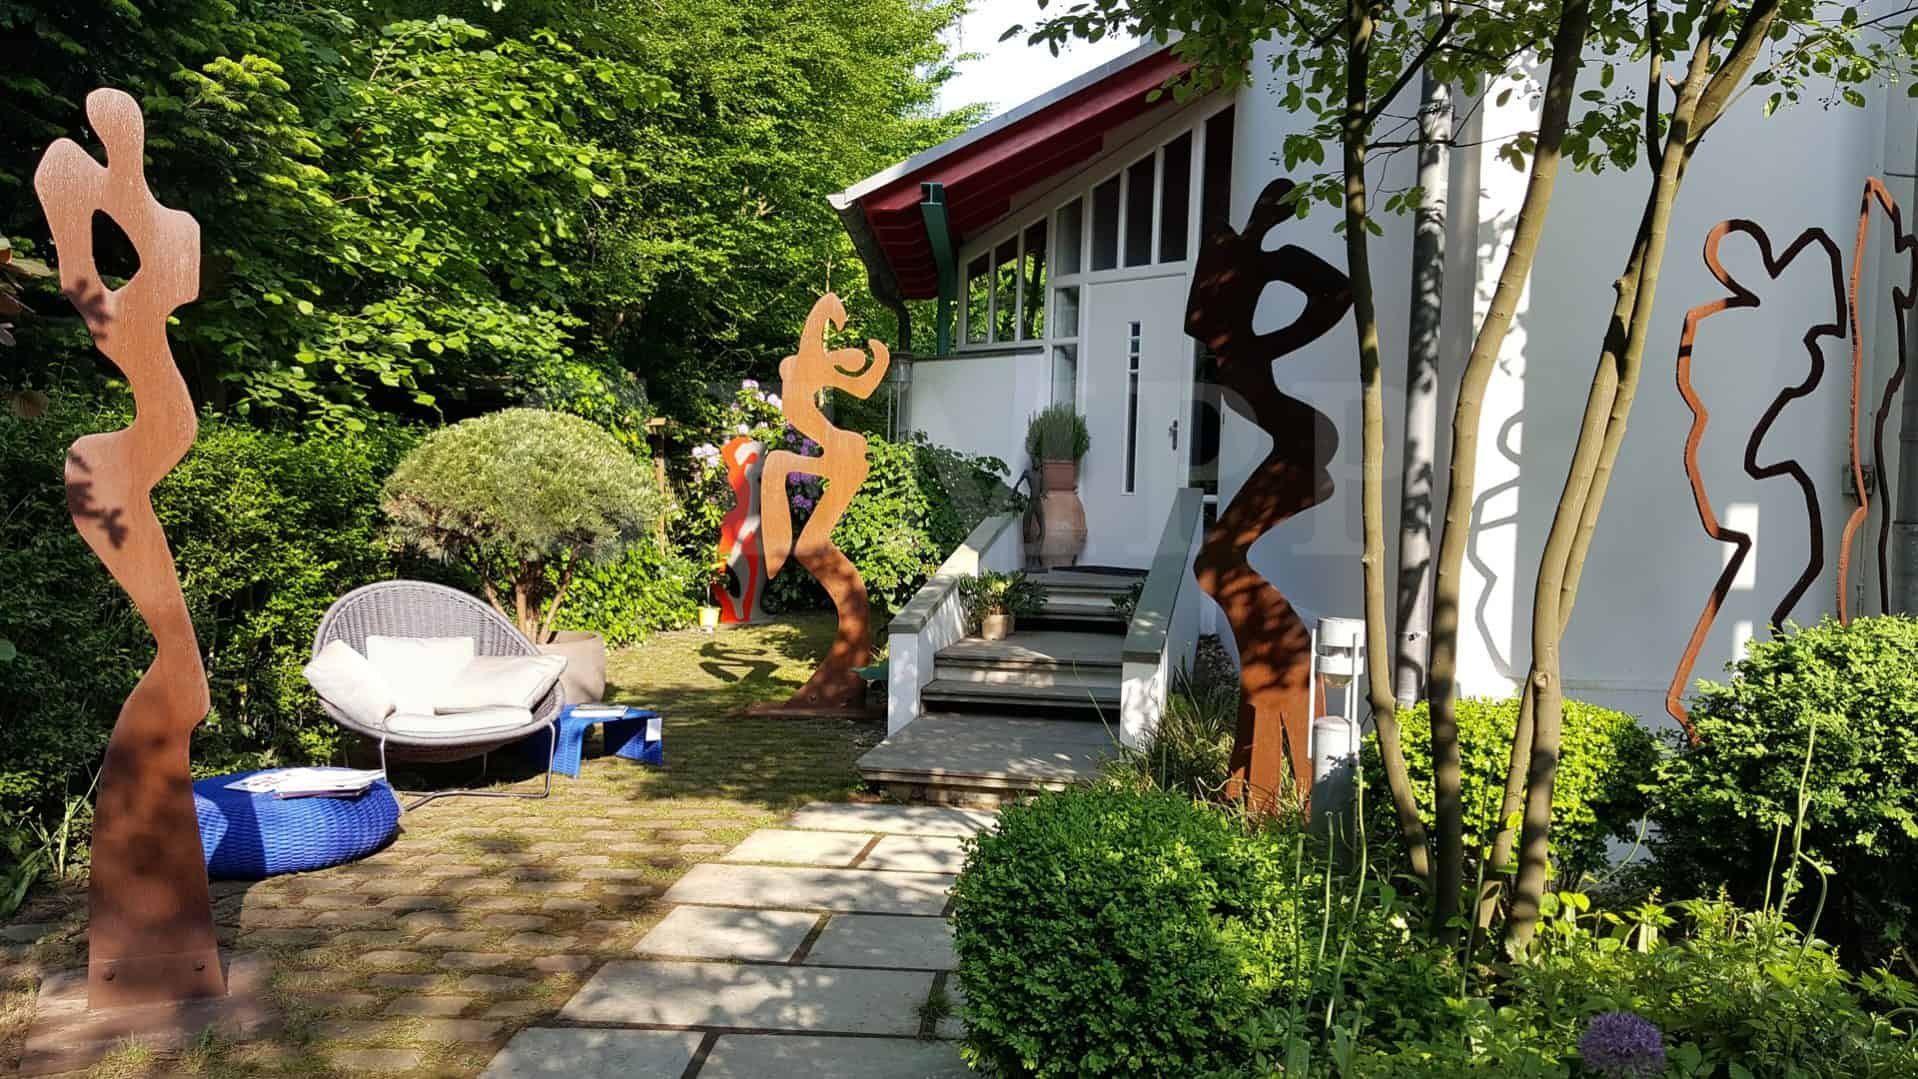 Moderne Gartenskulptur Aus Metall Rost Edelstahl